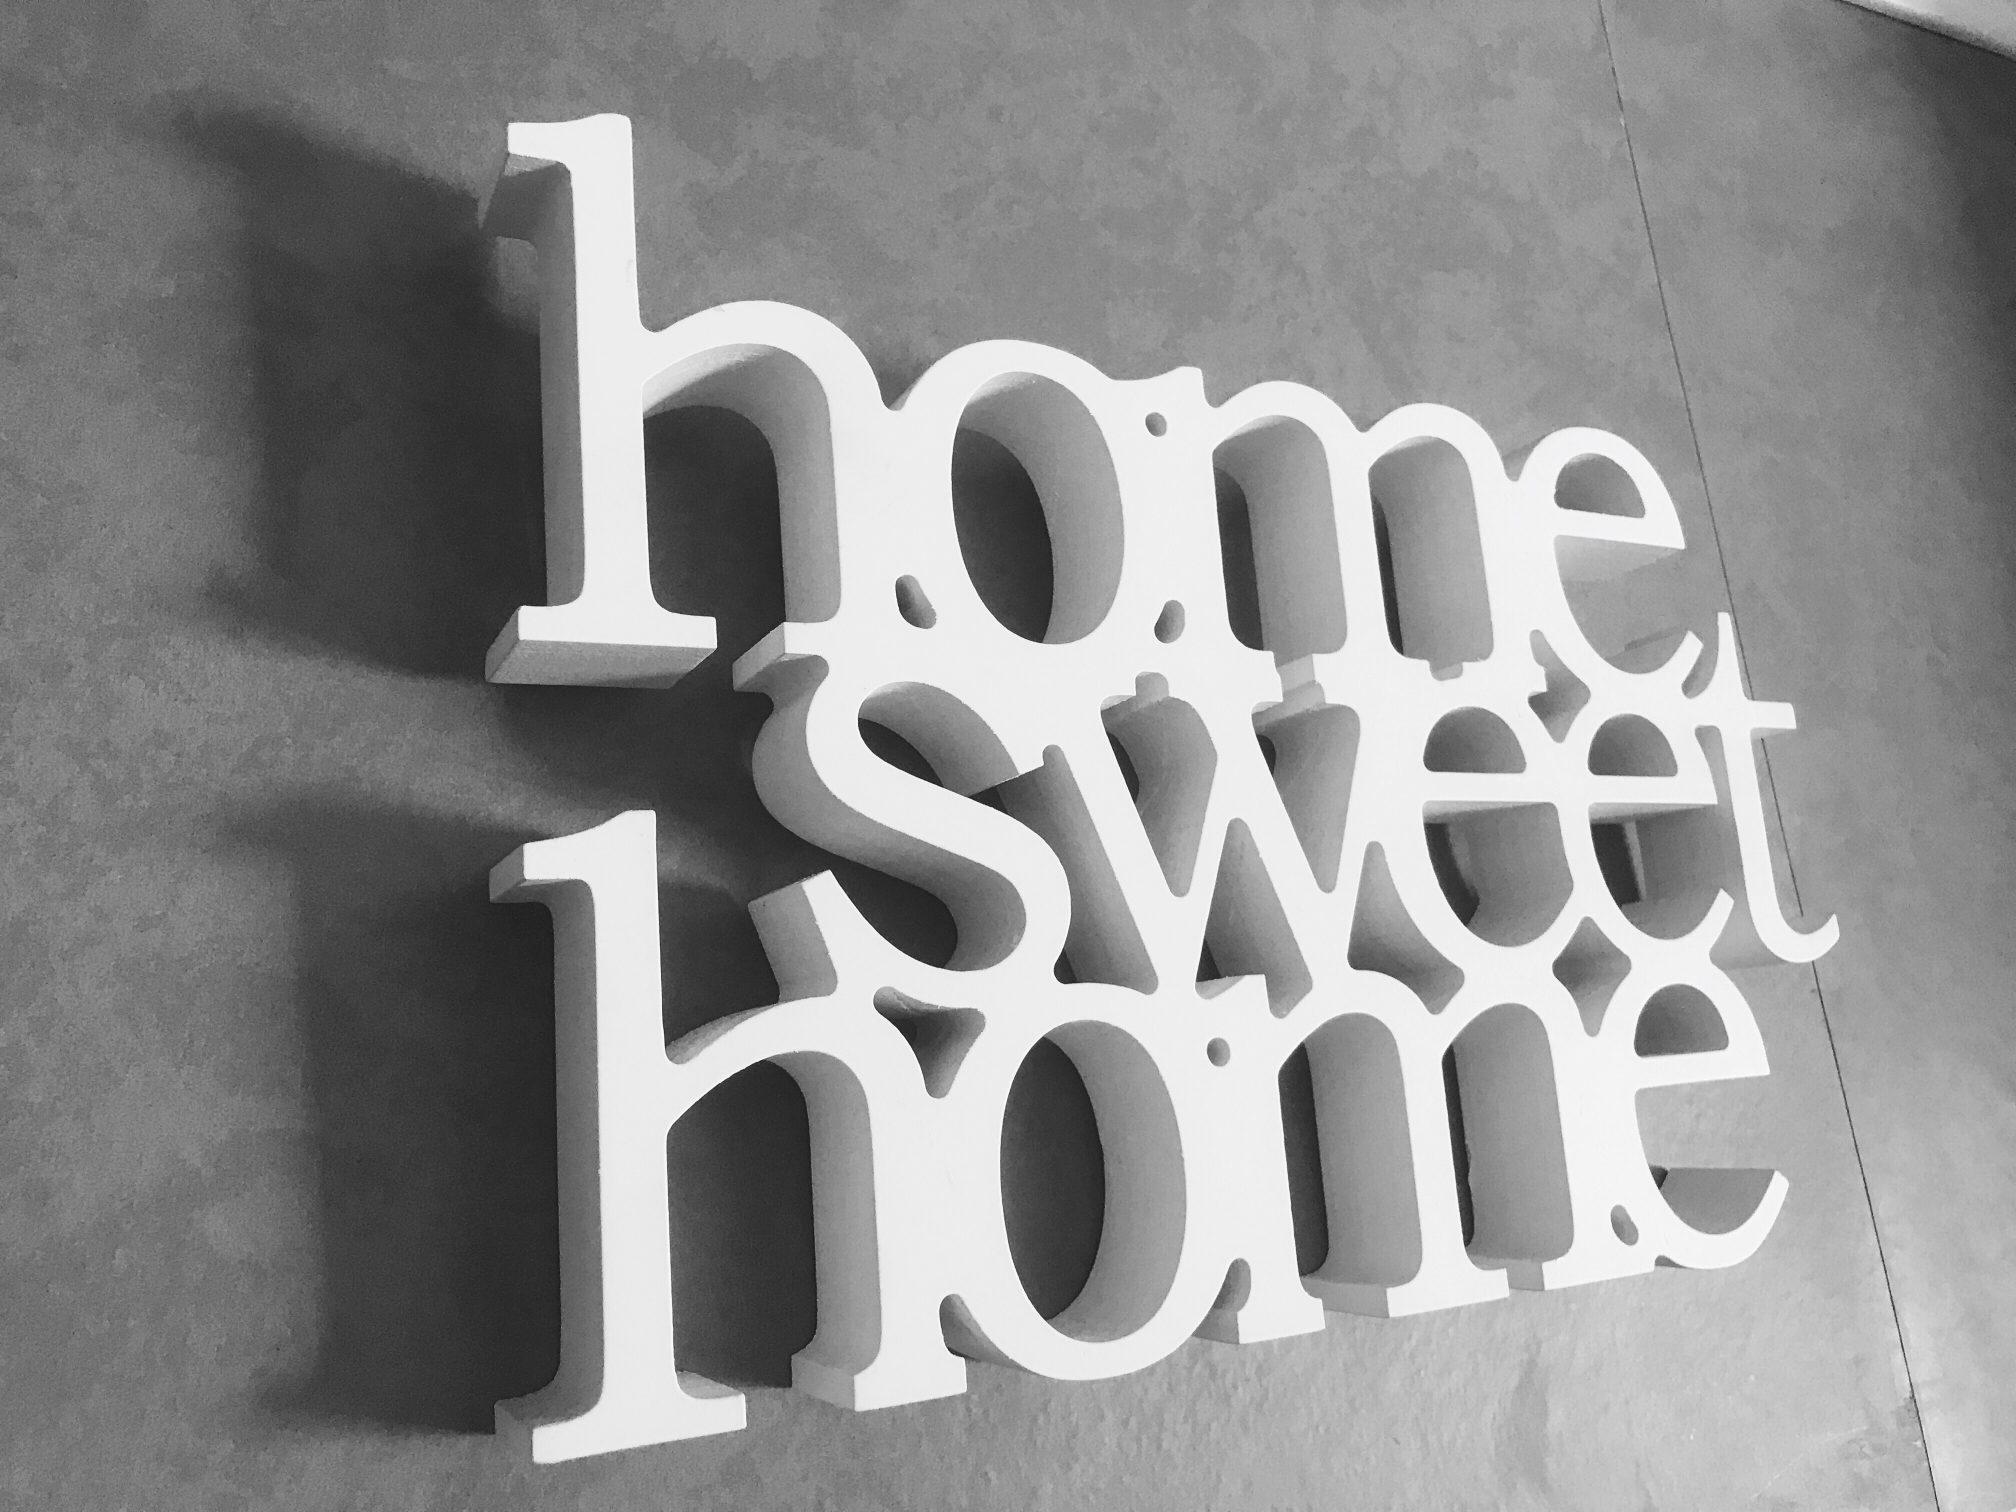 Homeoireet